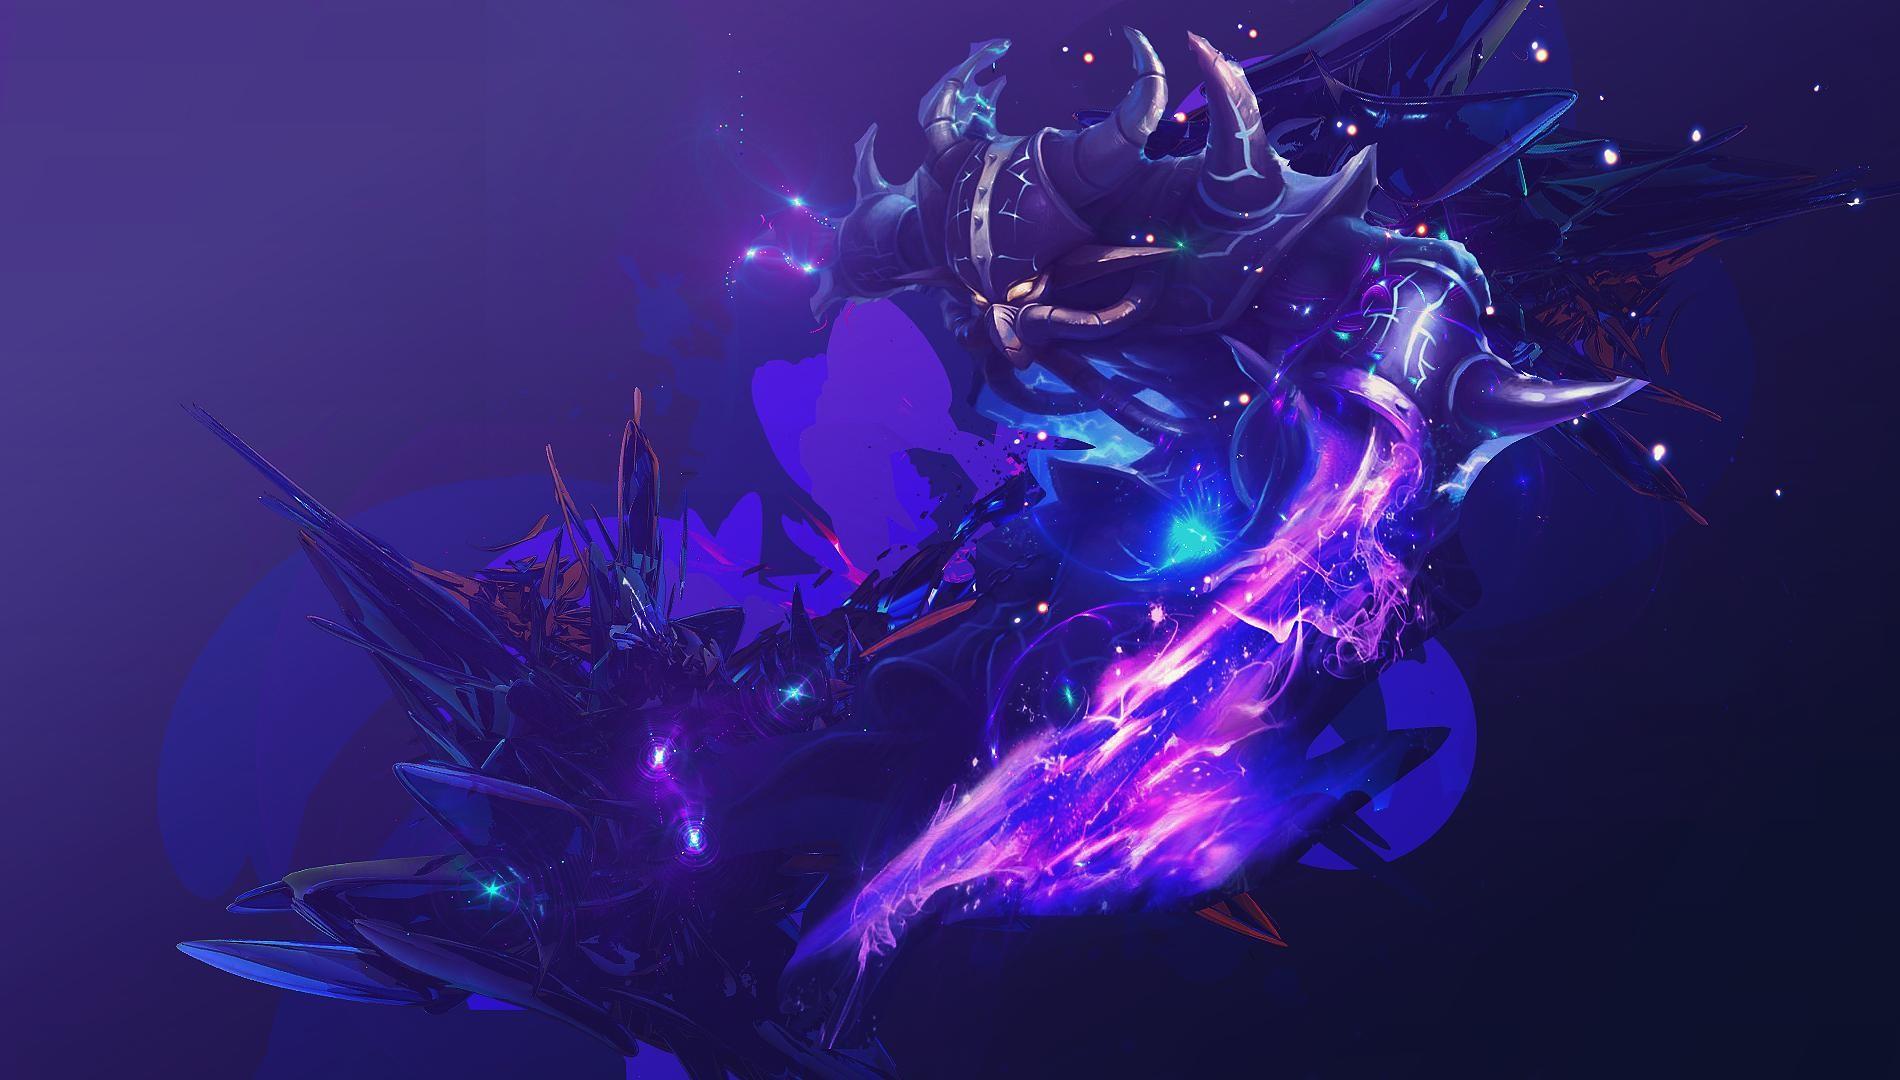 Wallpaper Illustration League Of Legends Blue Biology